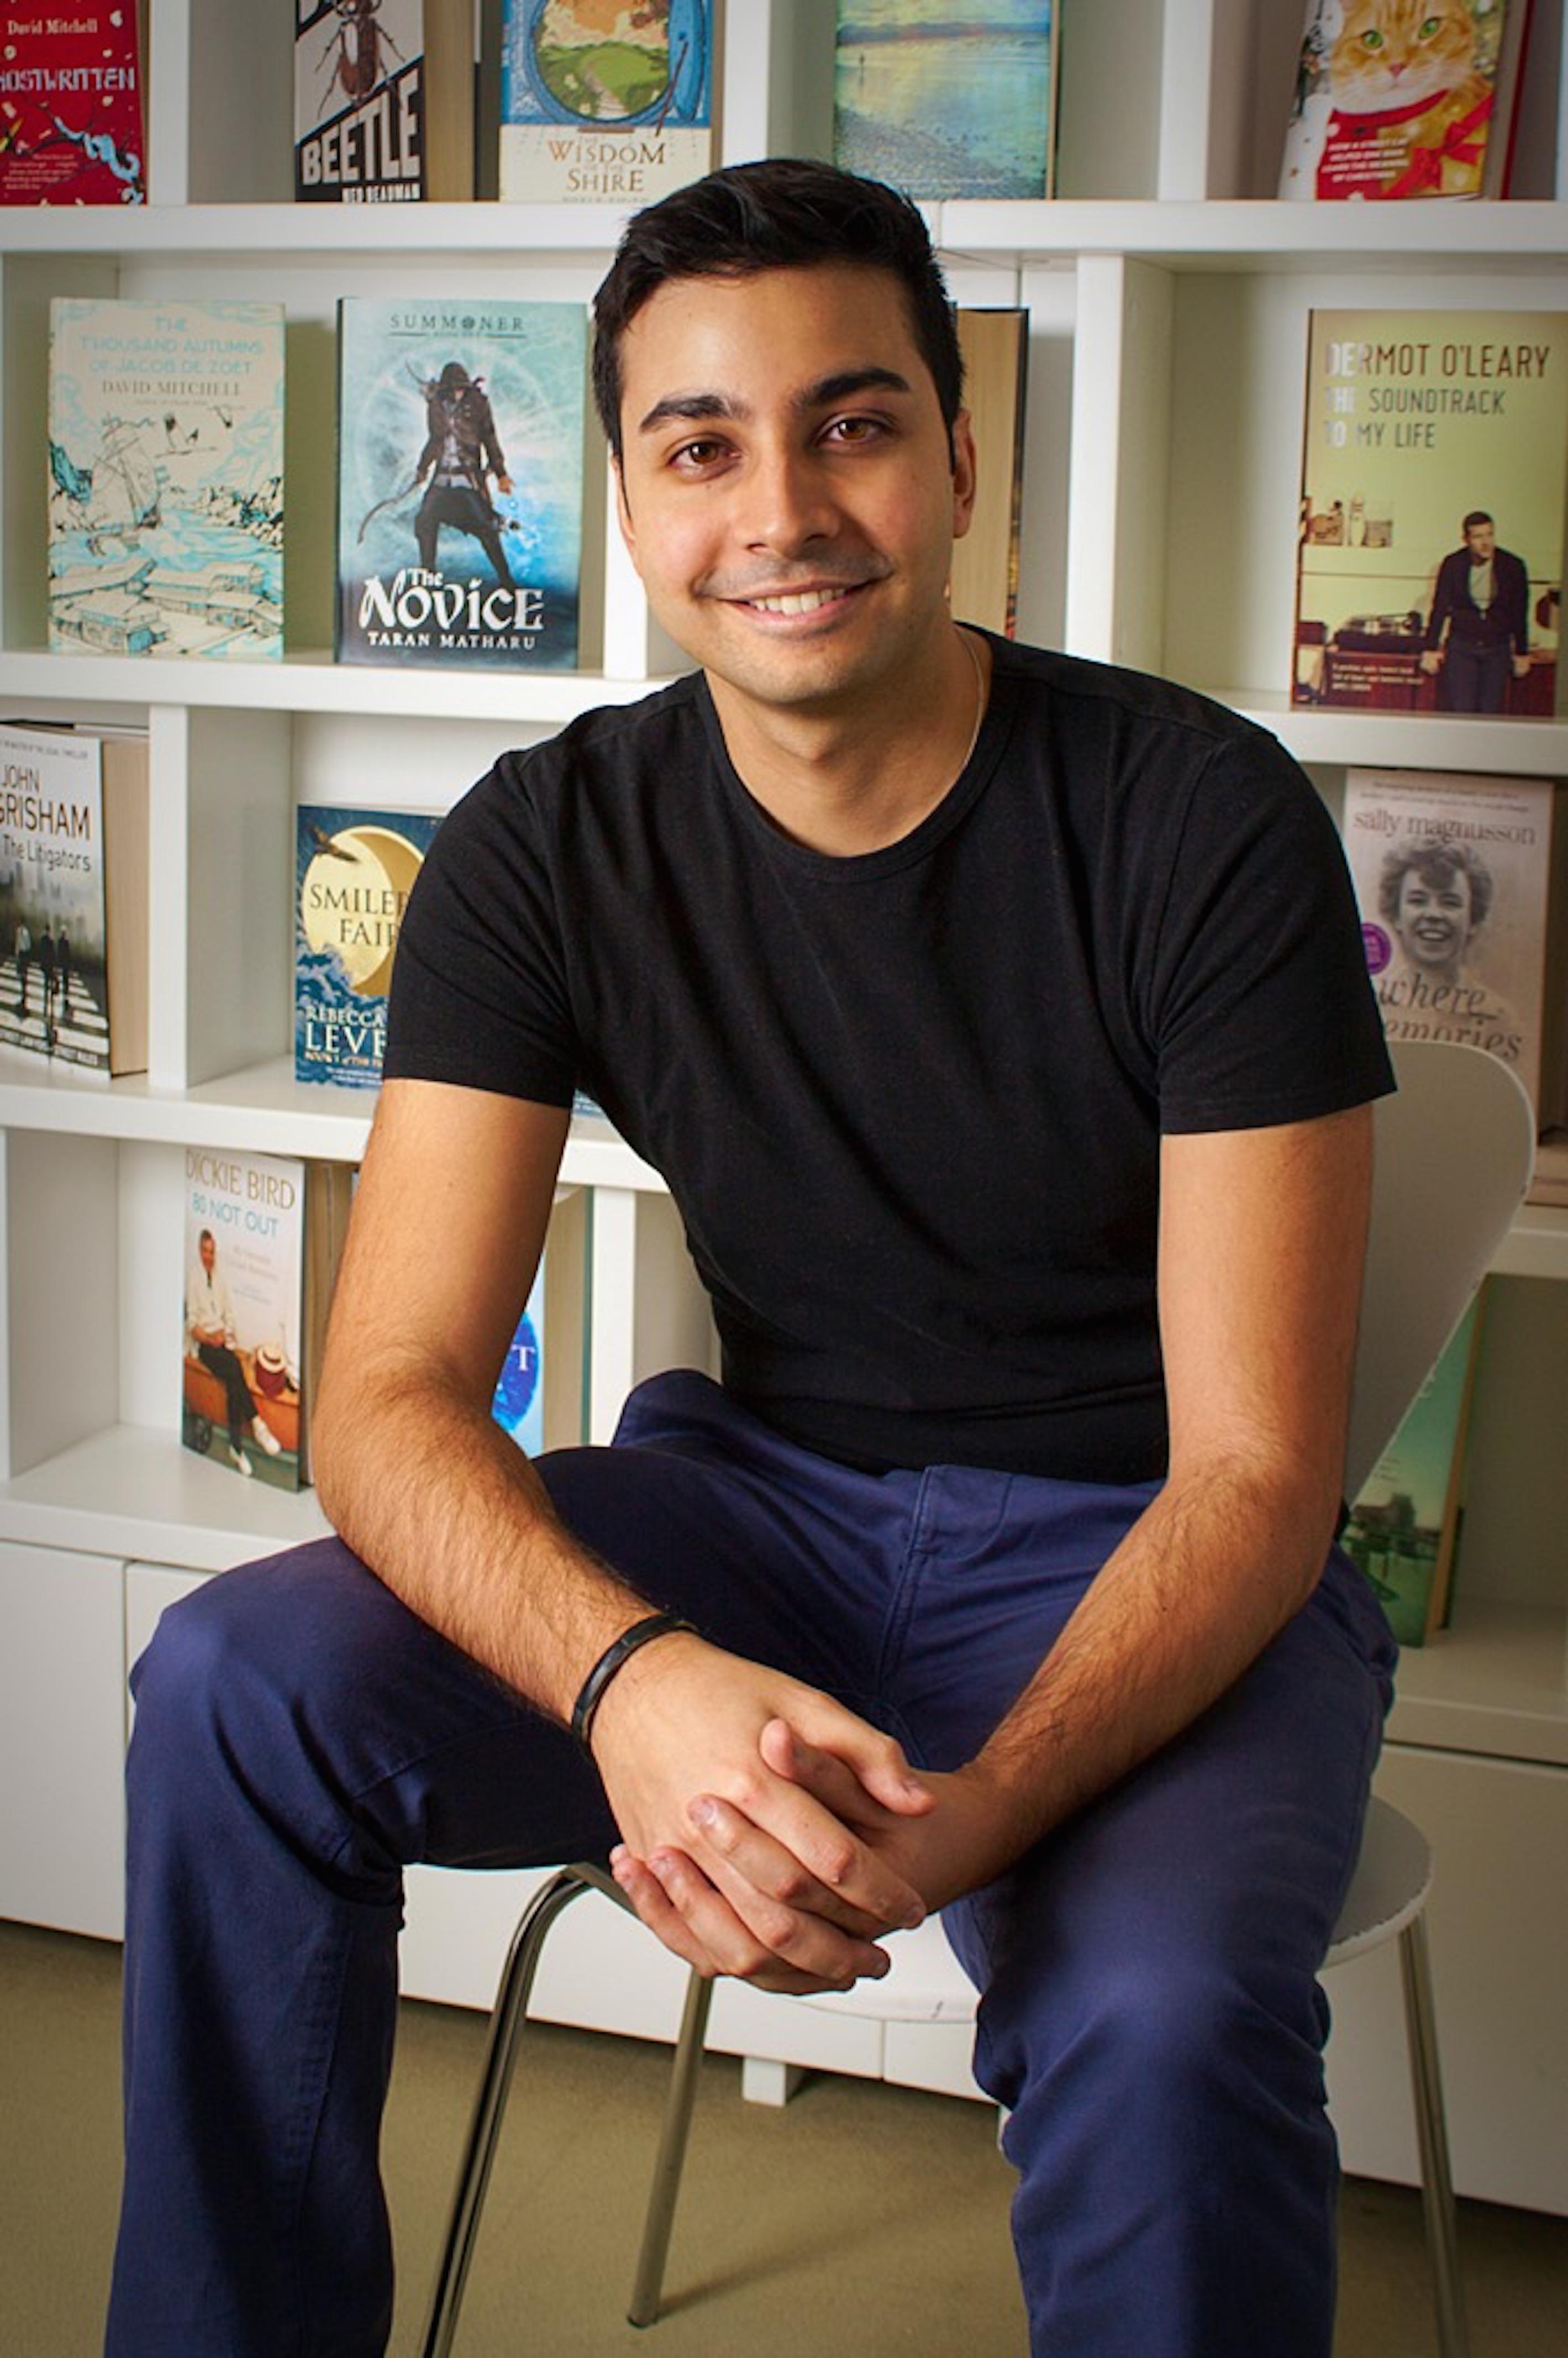 Taran Matharu at https://theculturetrip.com/europe/united-kingdom/england/london/articles/meet-london-based-author-of-summoner-the-novice-taran-matharu/